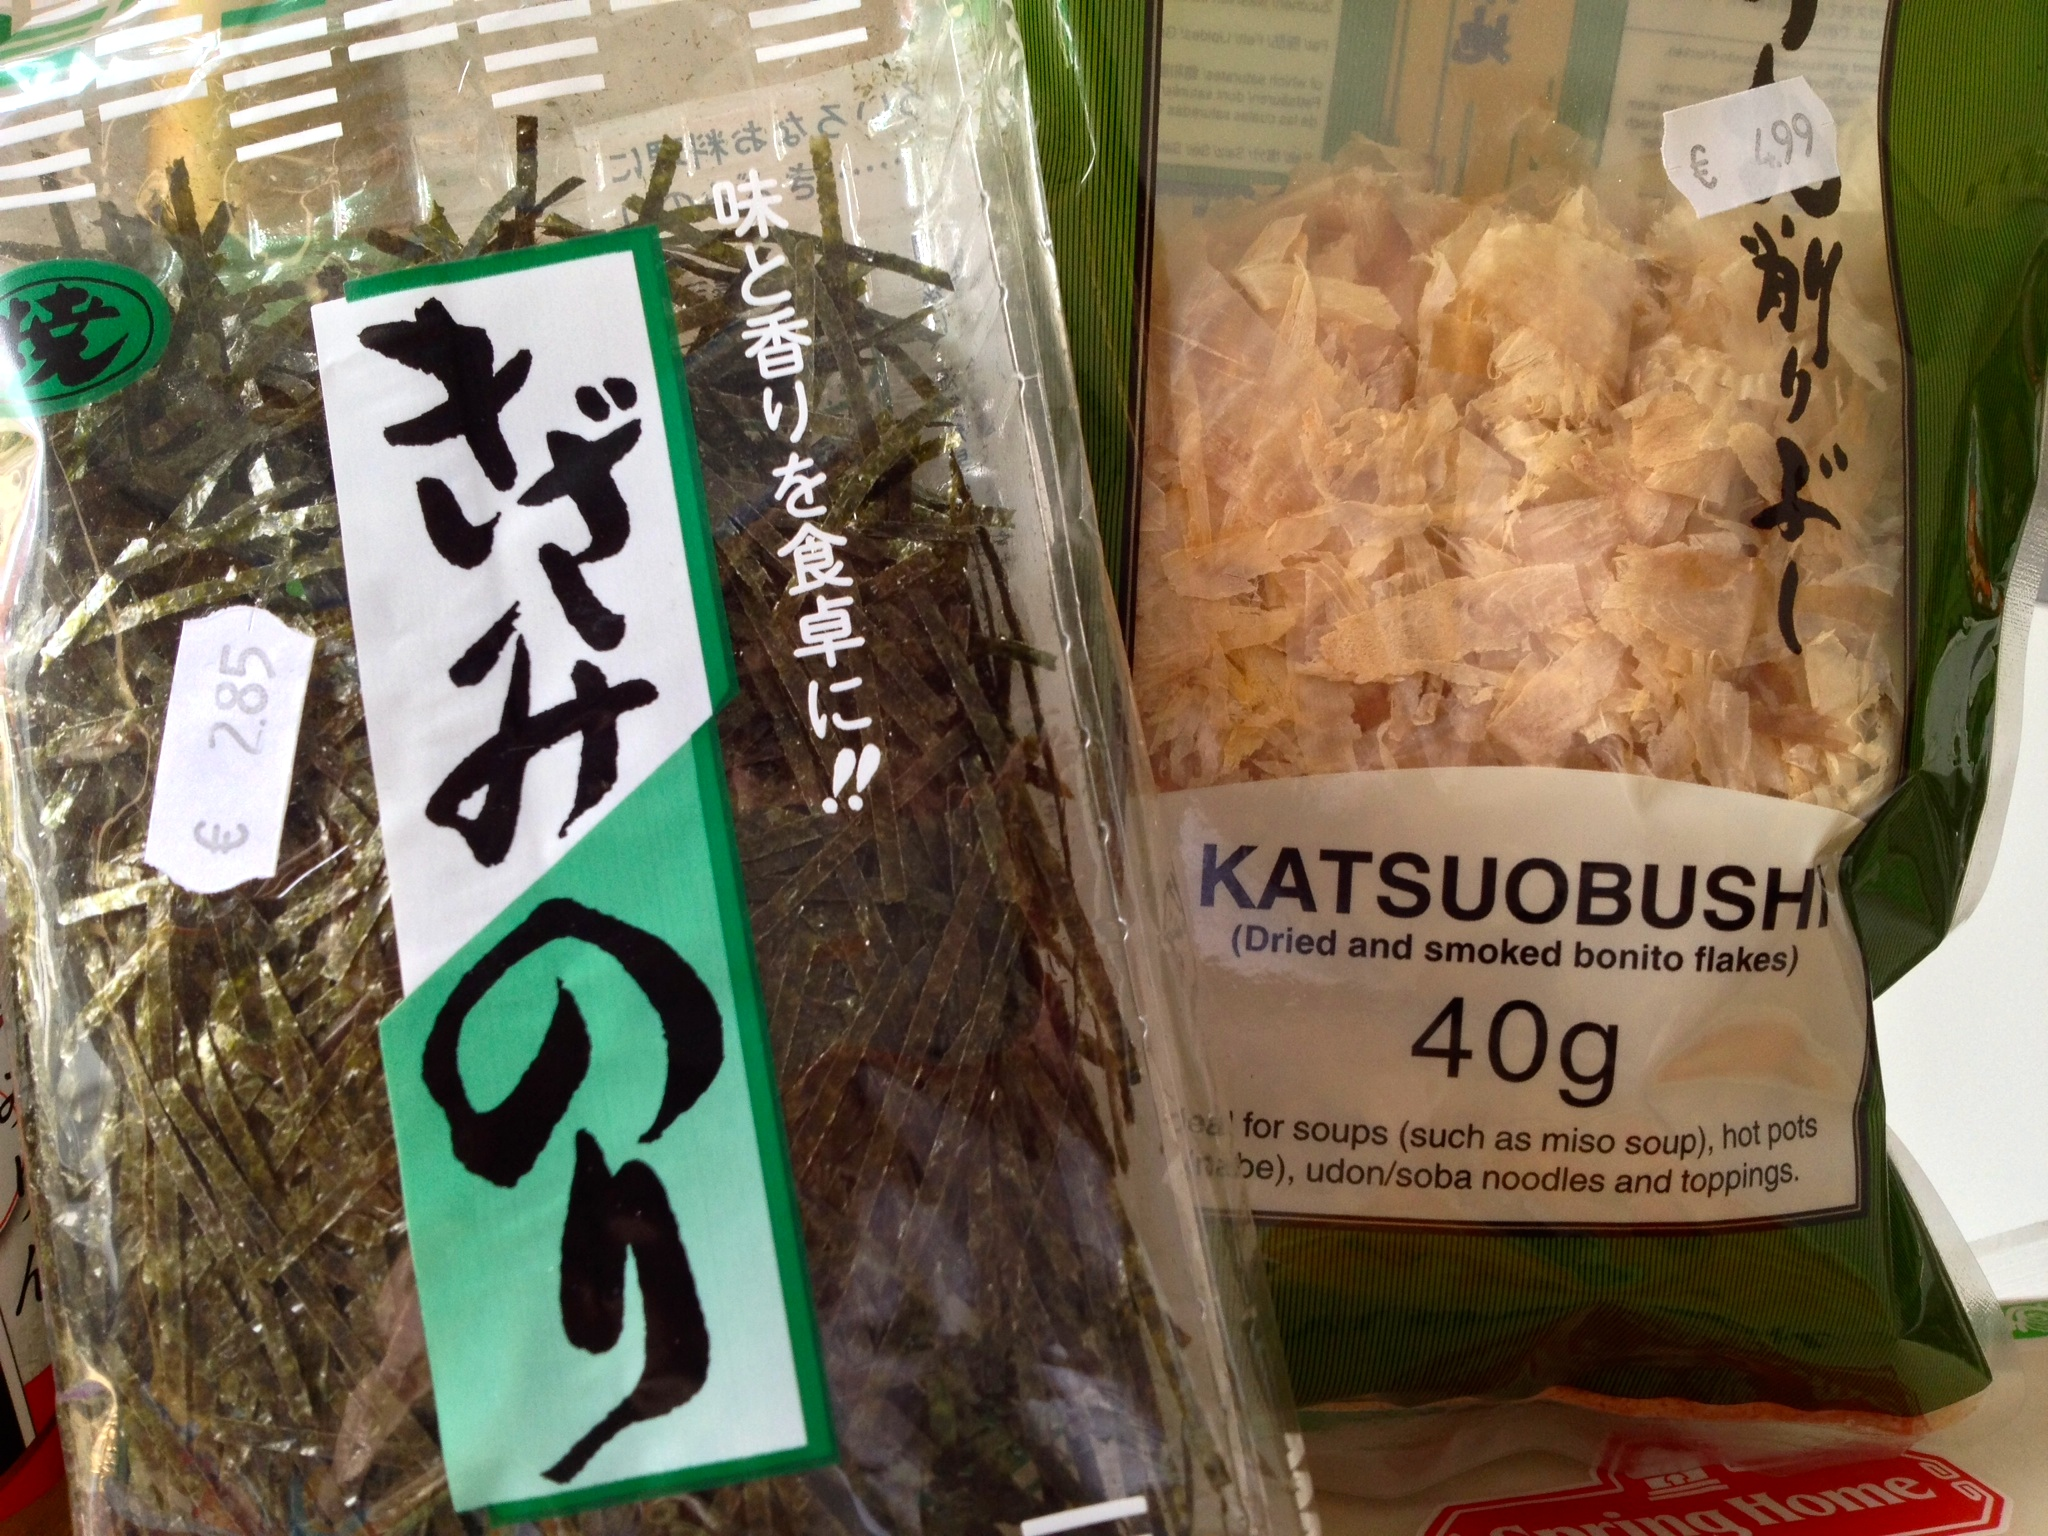 Nori (dried seaweed) strips and dried fish flakes